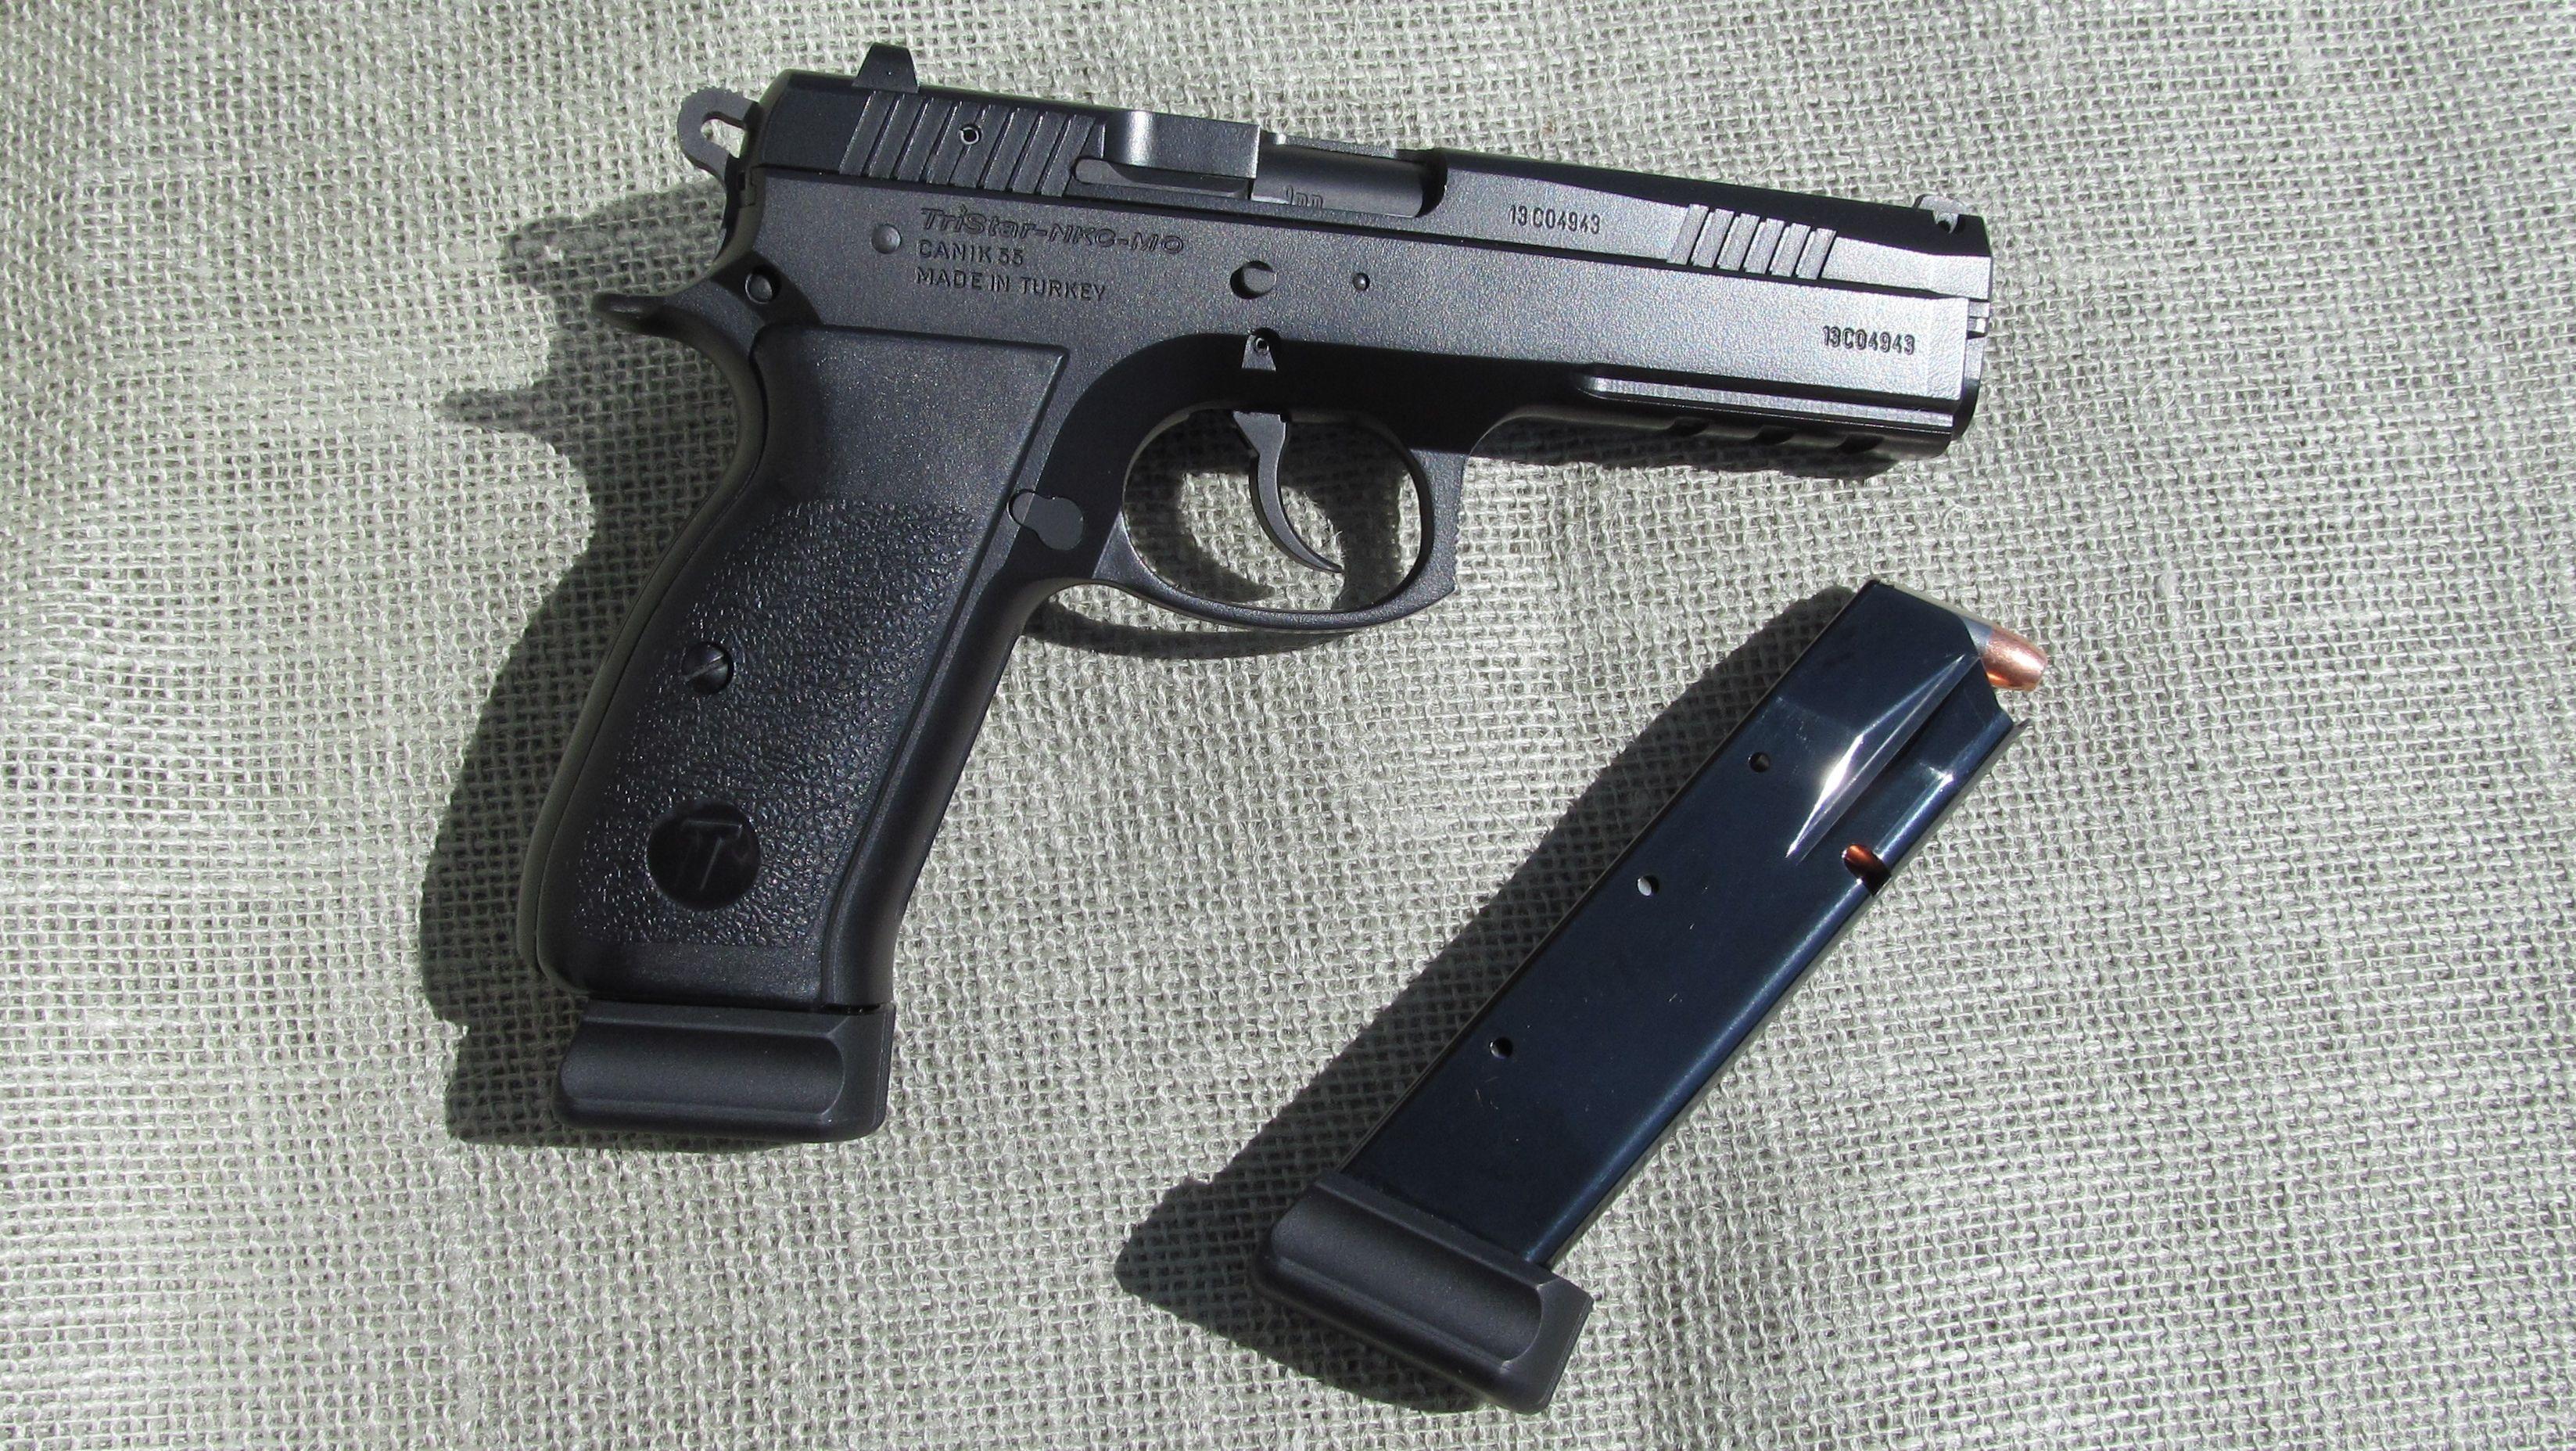 Pin On Handgun Rifle And Balas